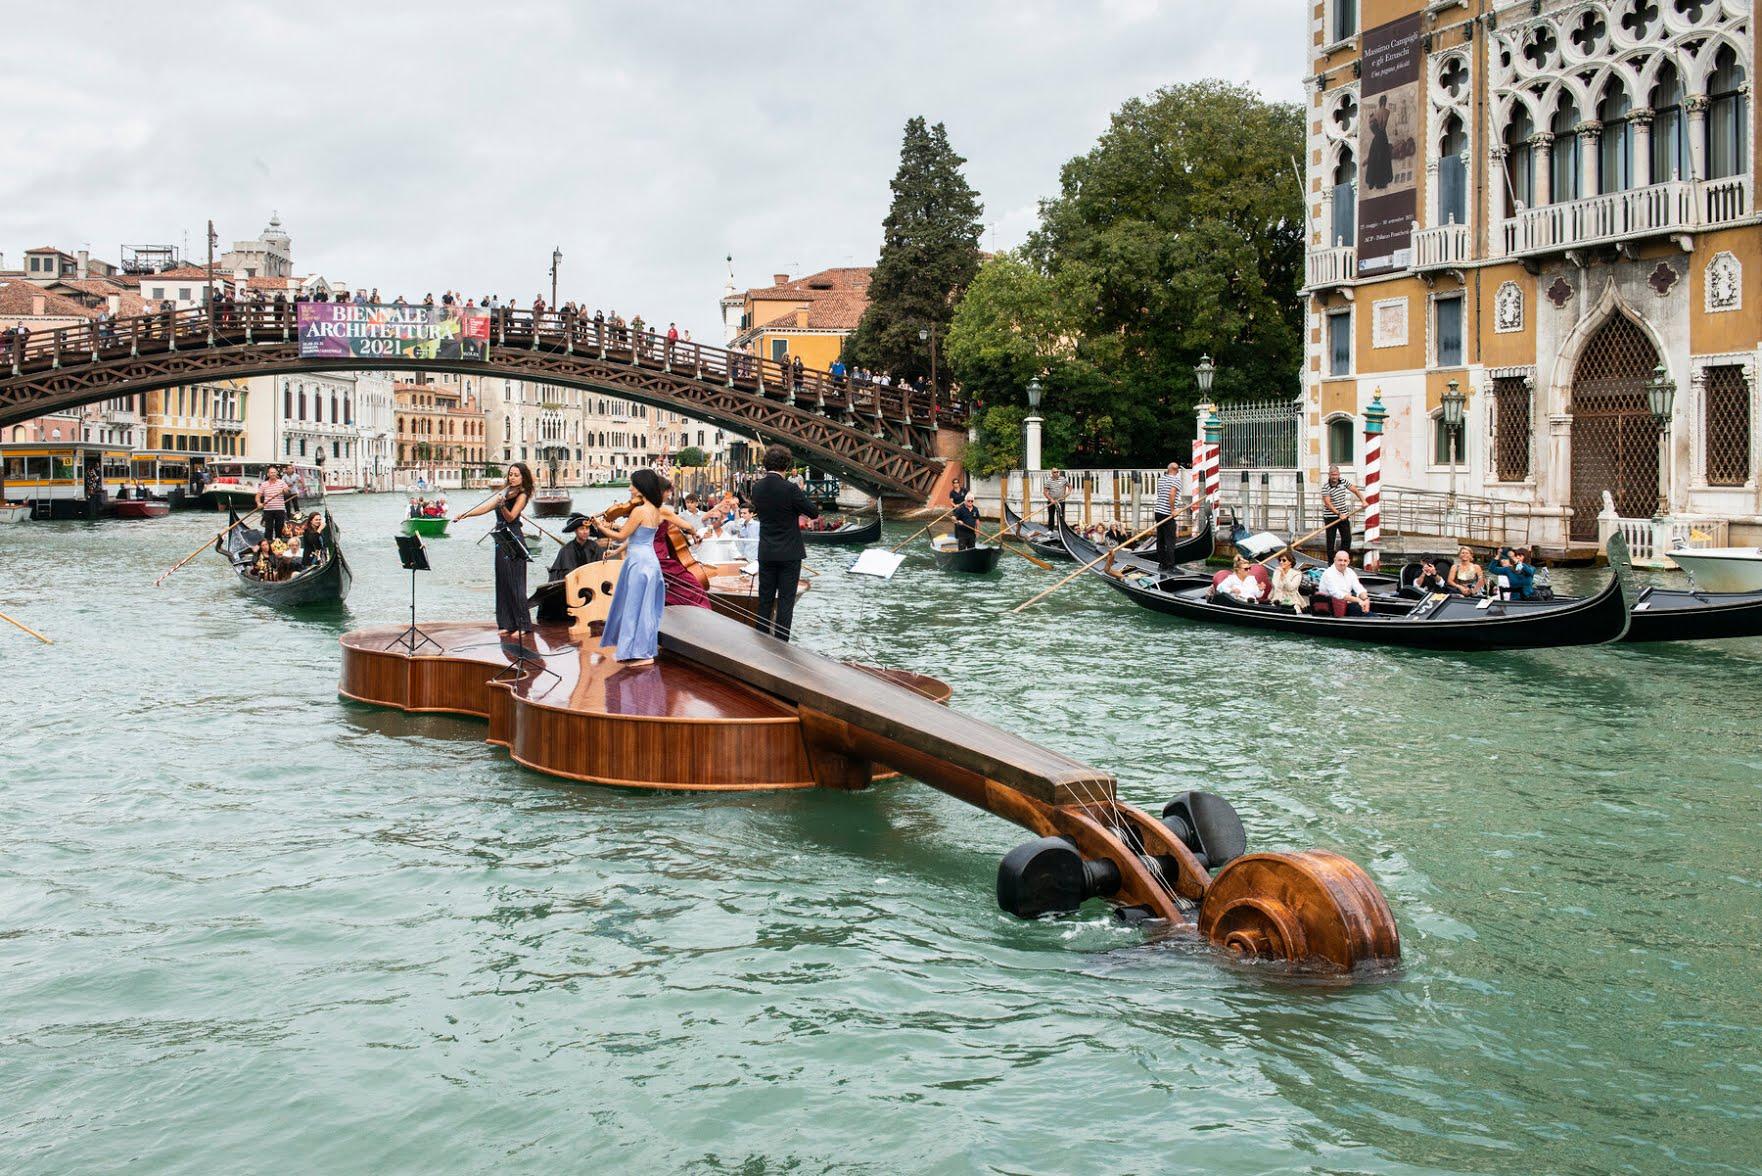 Musicians played Vivaldi atop the artist Livio De Marchi's floating violin in the Grand Canal in Venice.